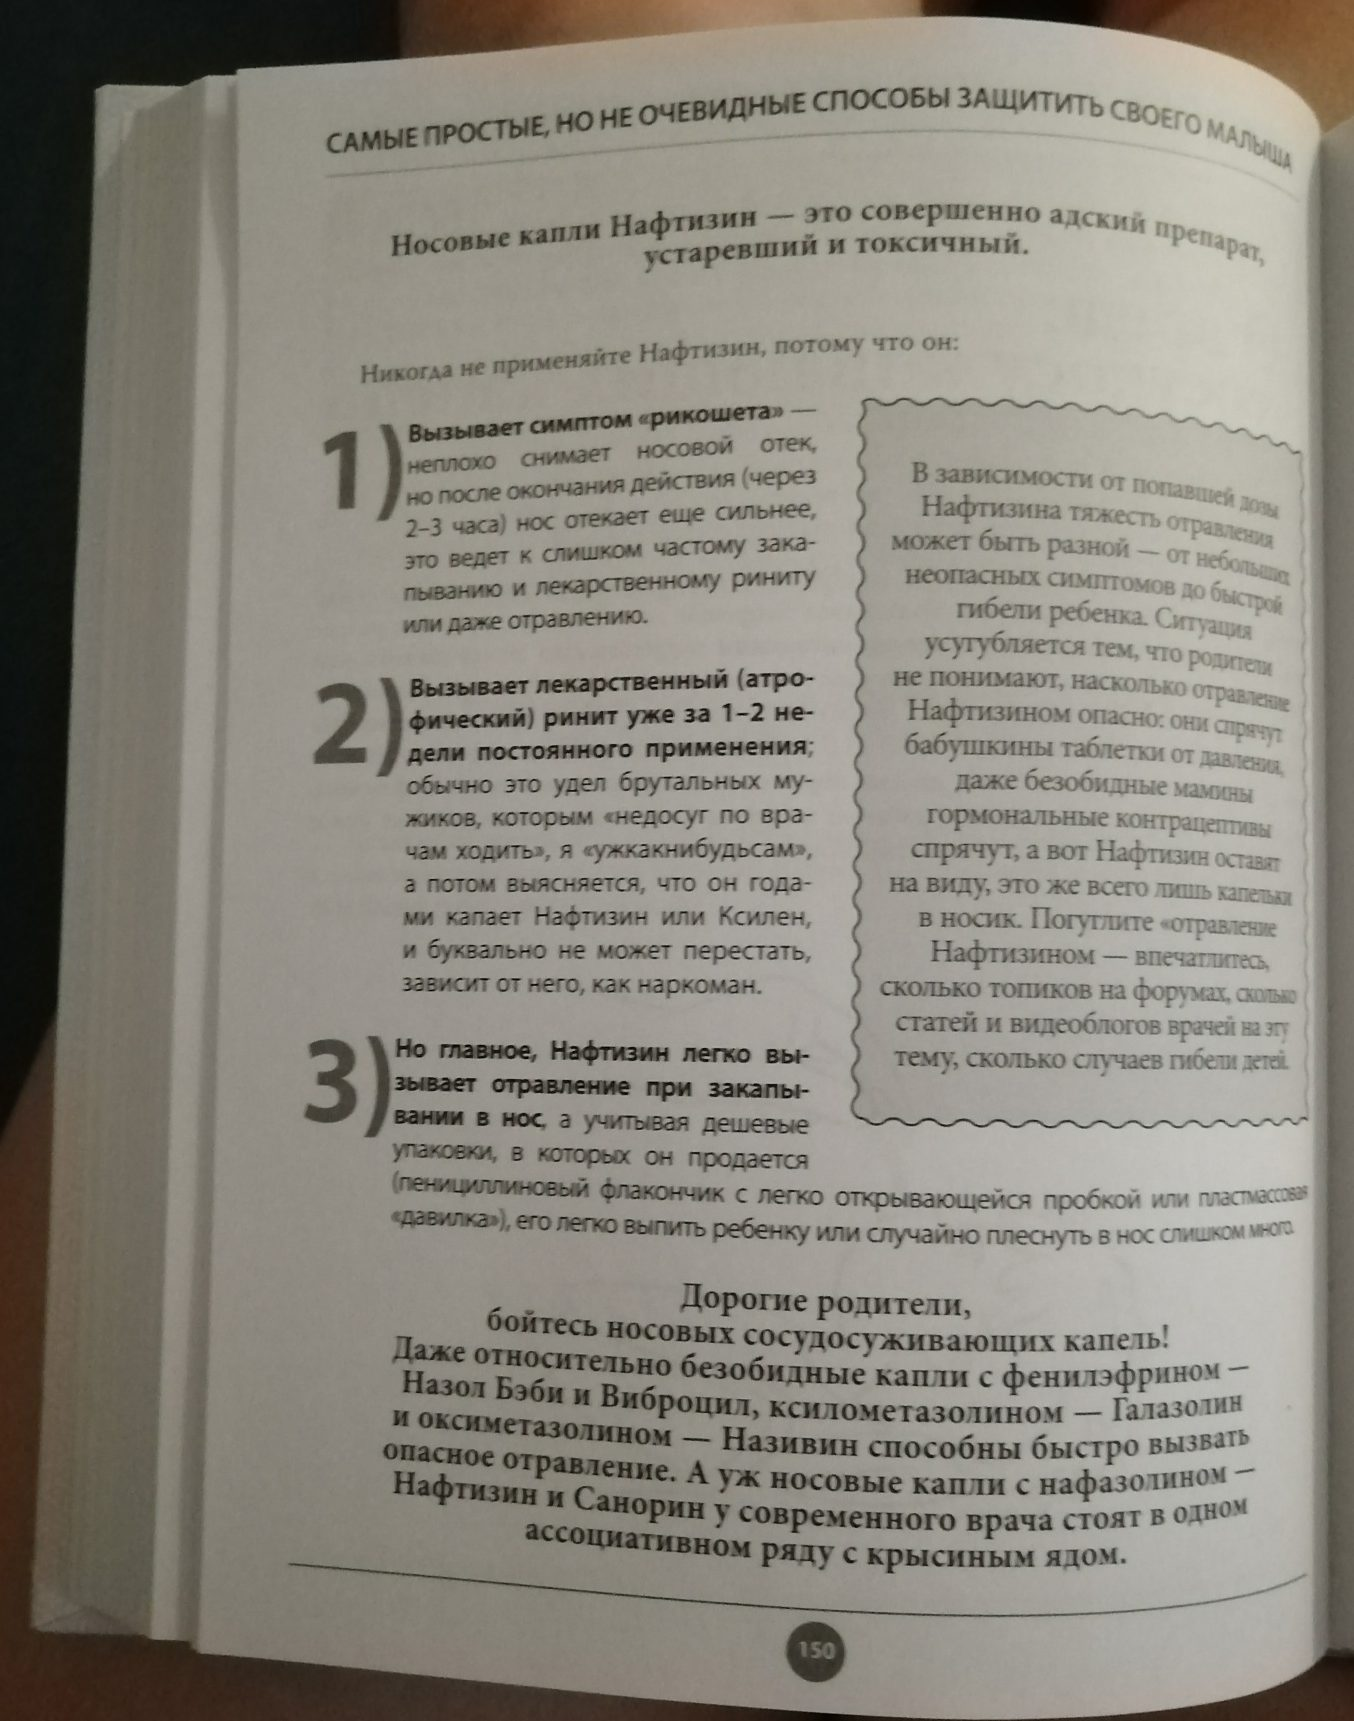 Сергей Бутрий о насморке